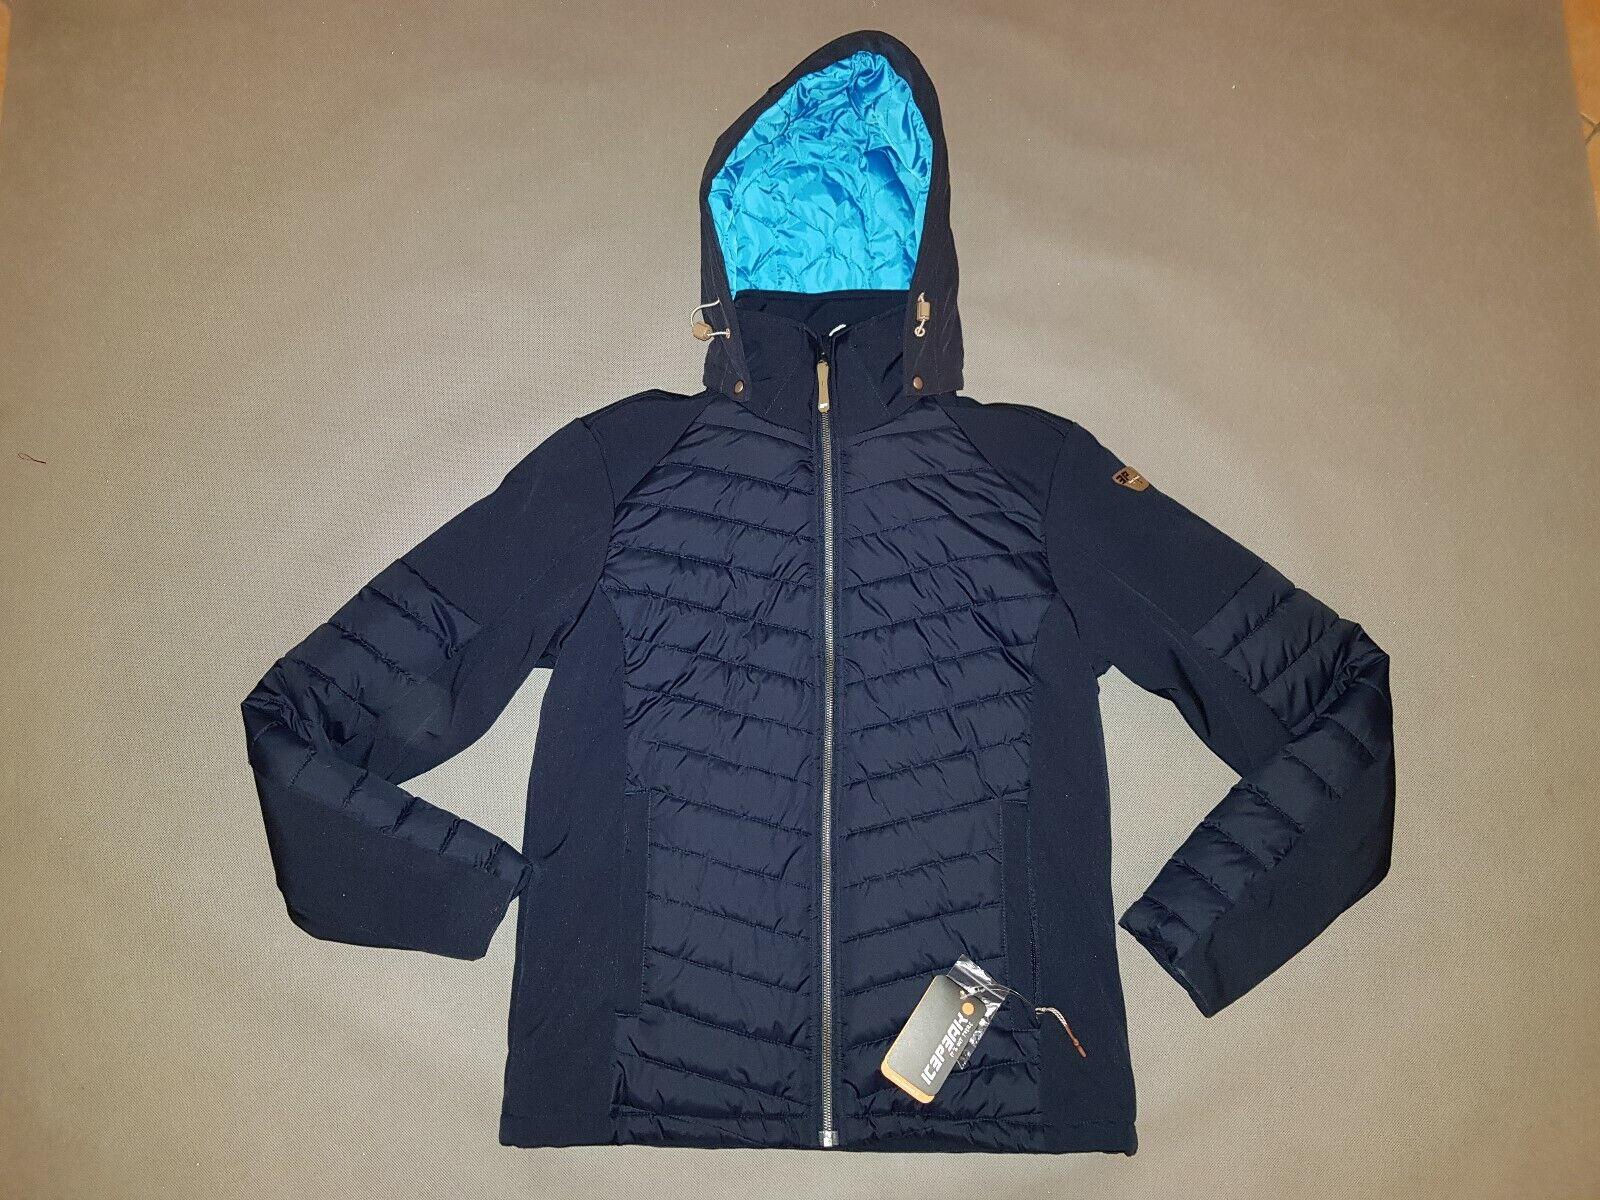 Icepeak Winterjacke TINO - Gr 54 - NEU - ArtNr 2 57 844 682 blau